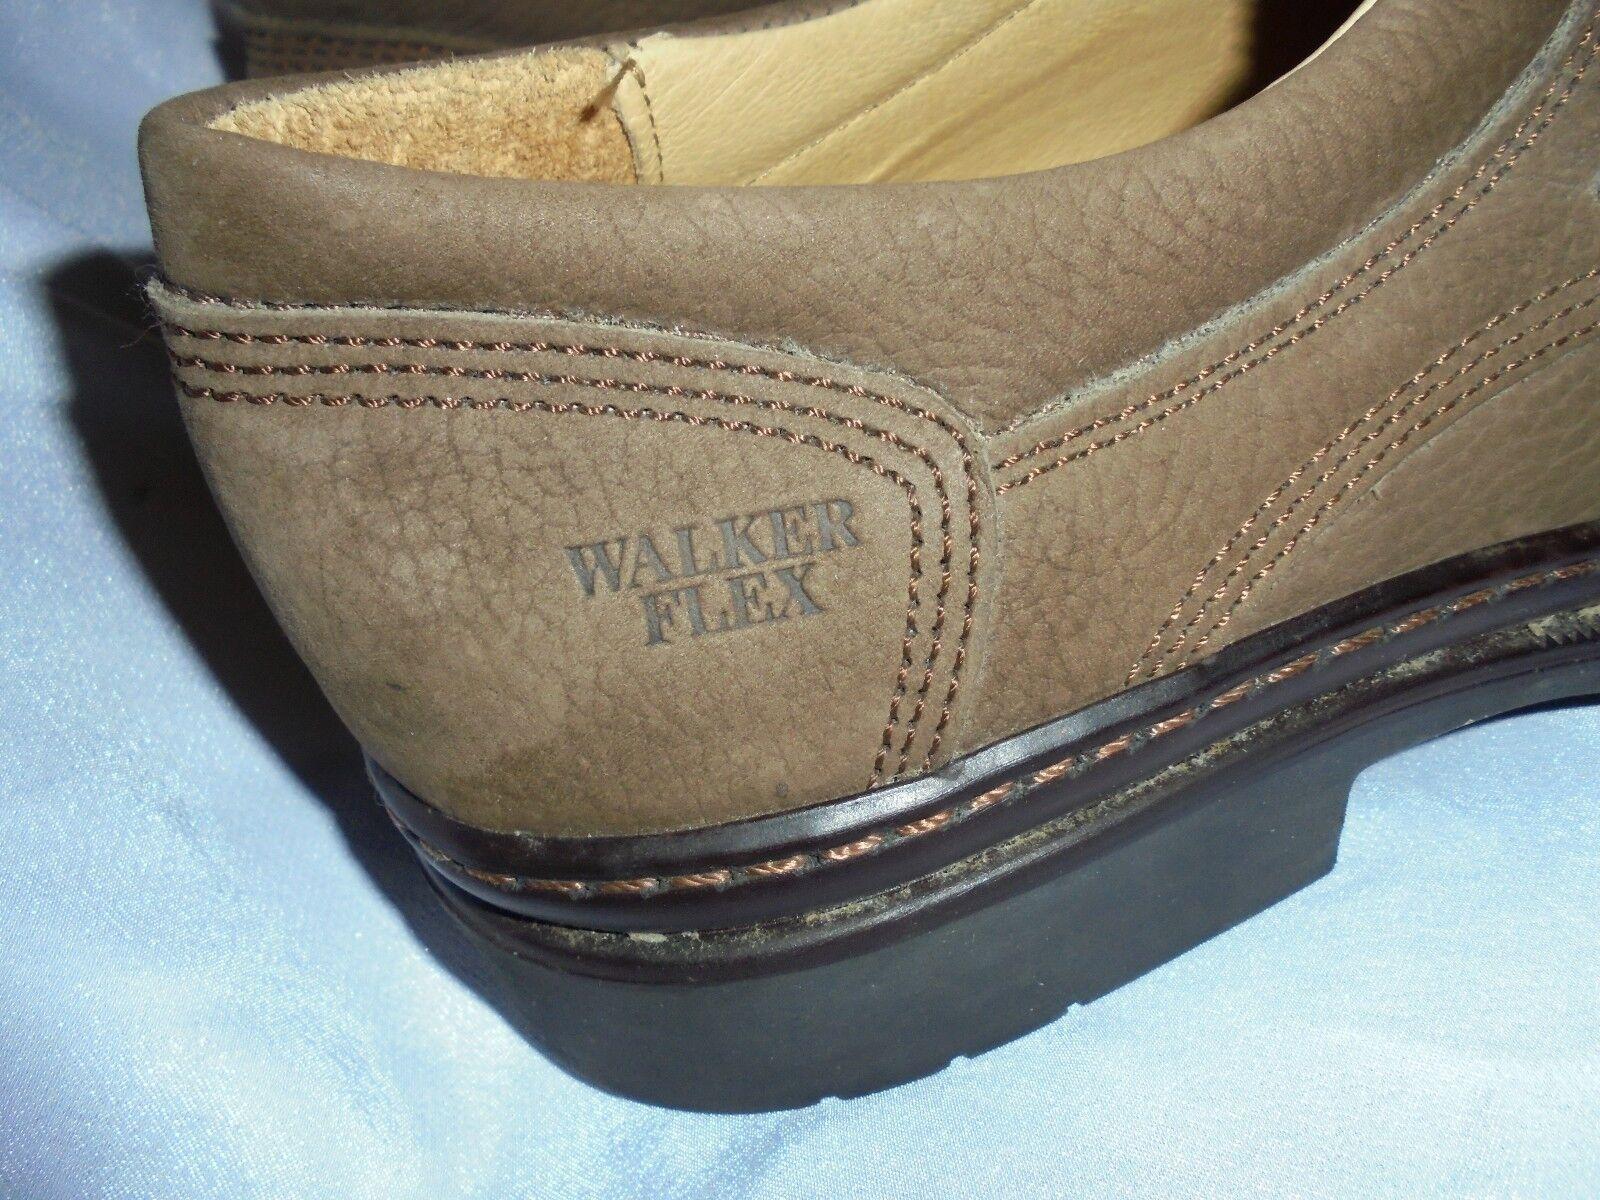 Walker Flex Uomo Marrone Pelle Slip On Cinturino Scarpe Misura Misura Misura EU 45 NUOVO SENZA ETICHETTE 9bfe56